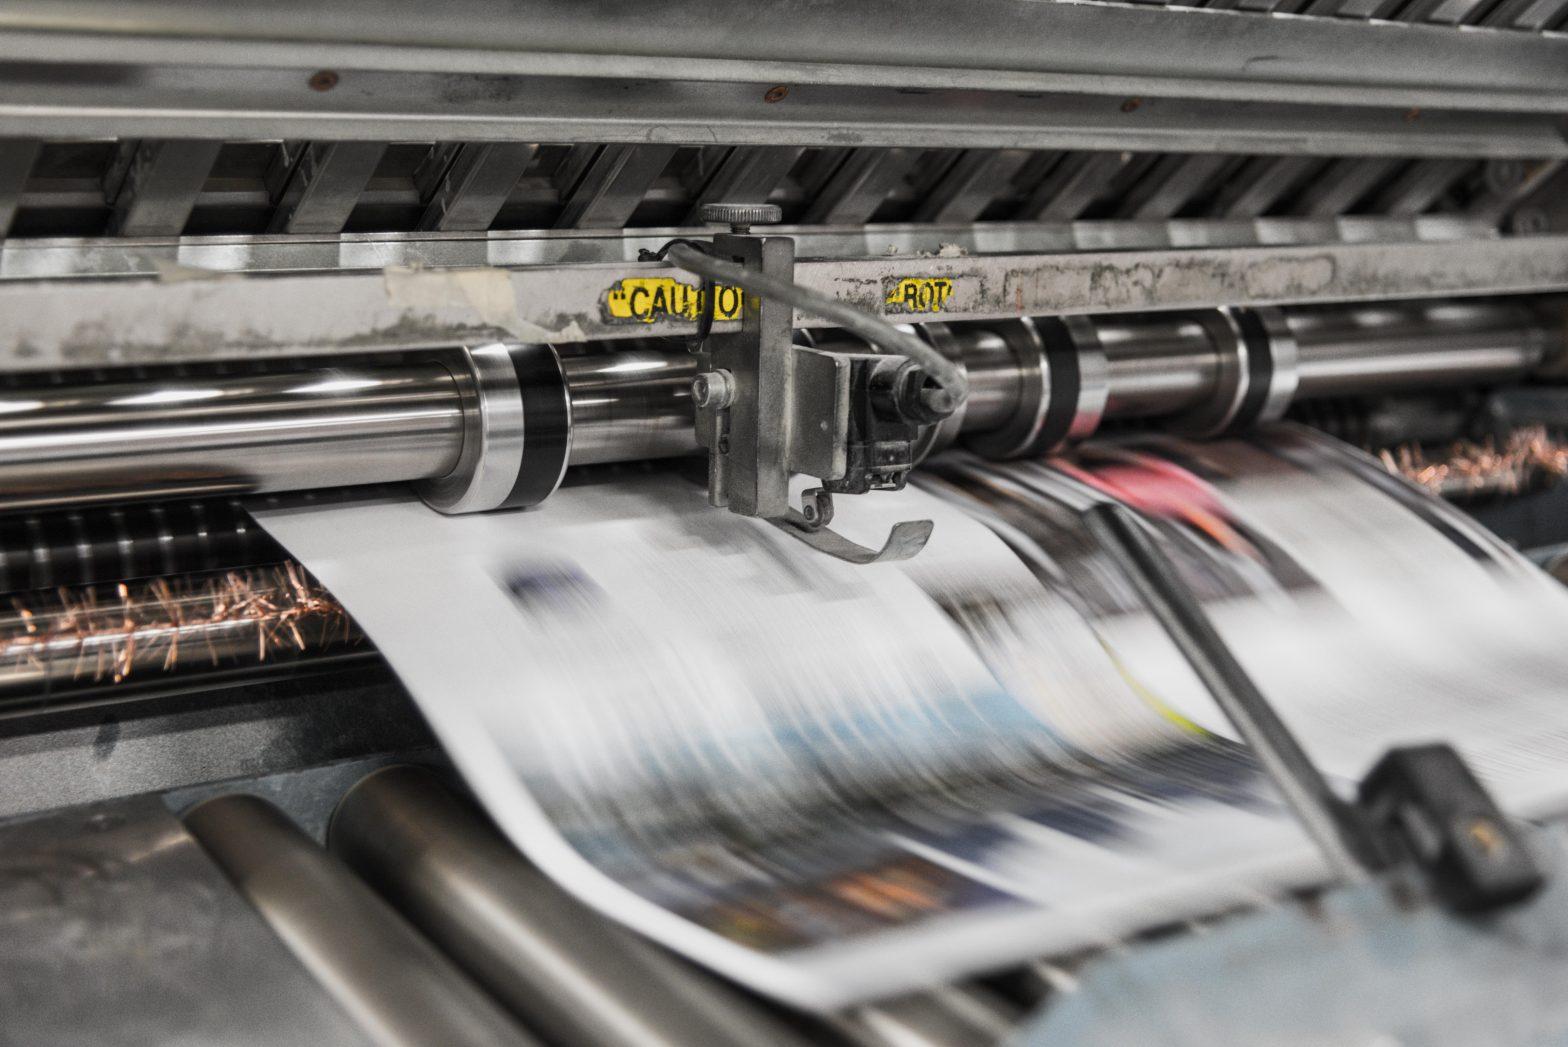 Imprenta digital y futuro